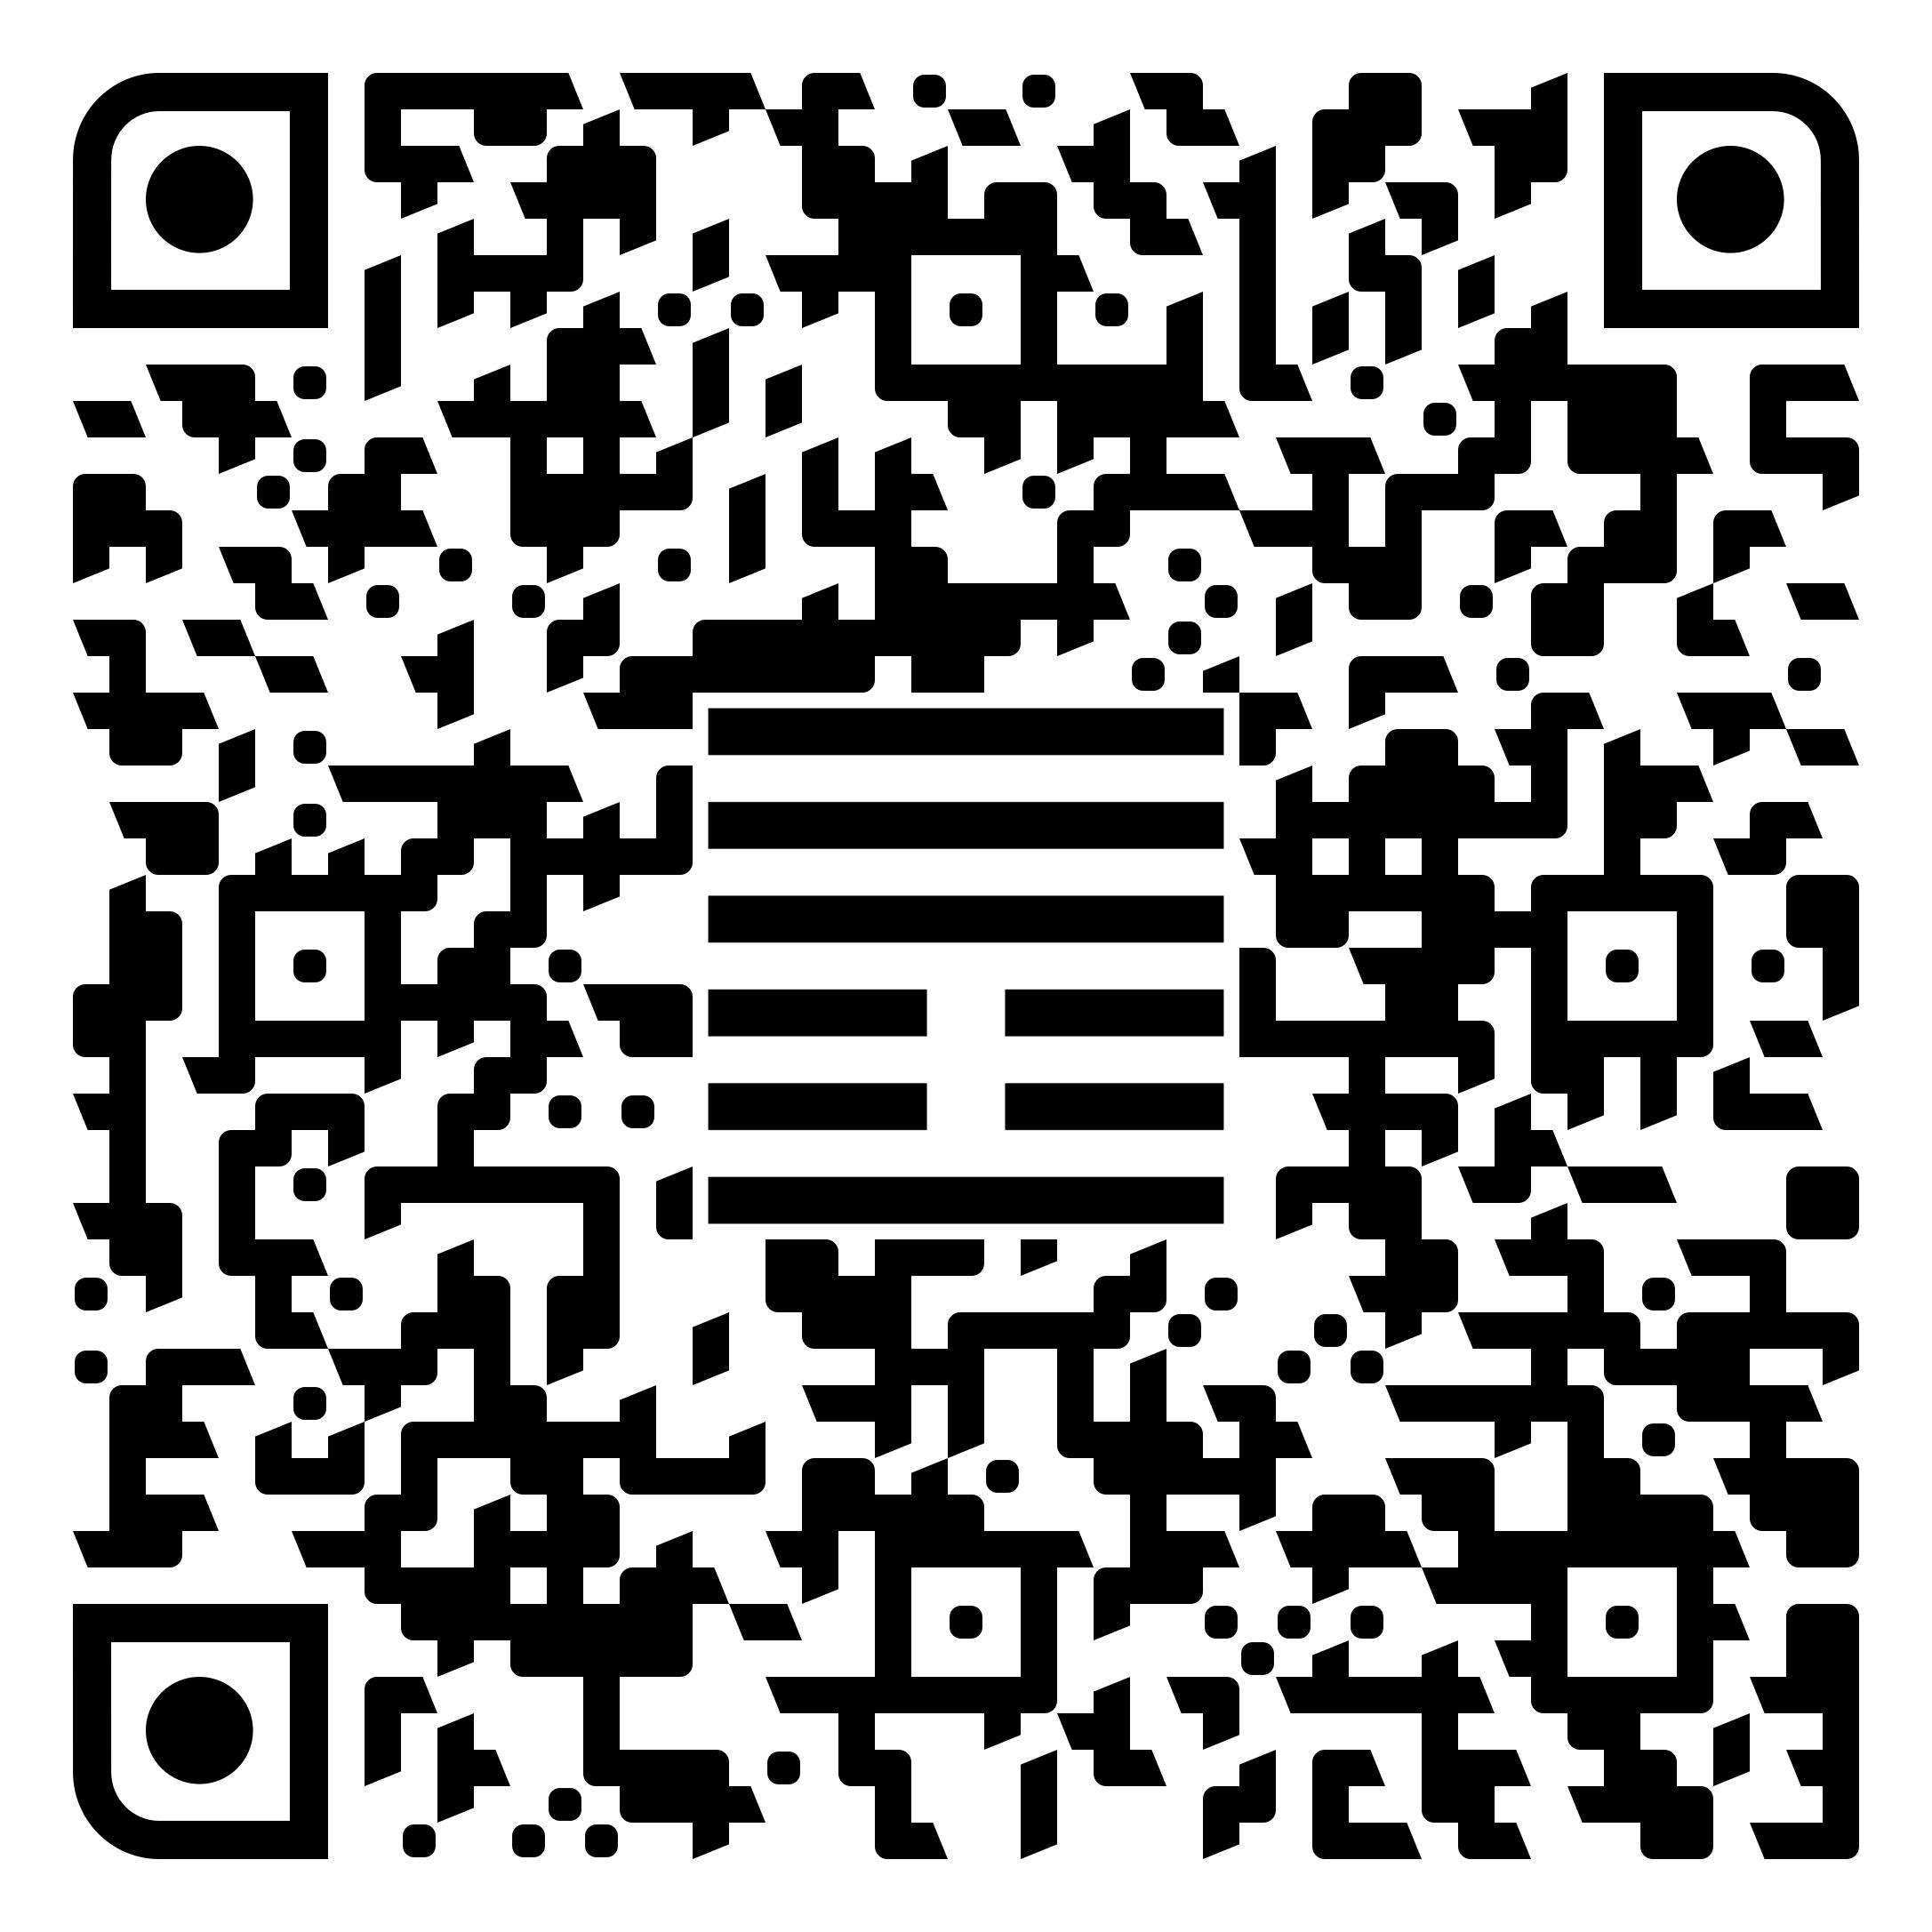 qr-code-25.png